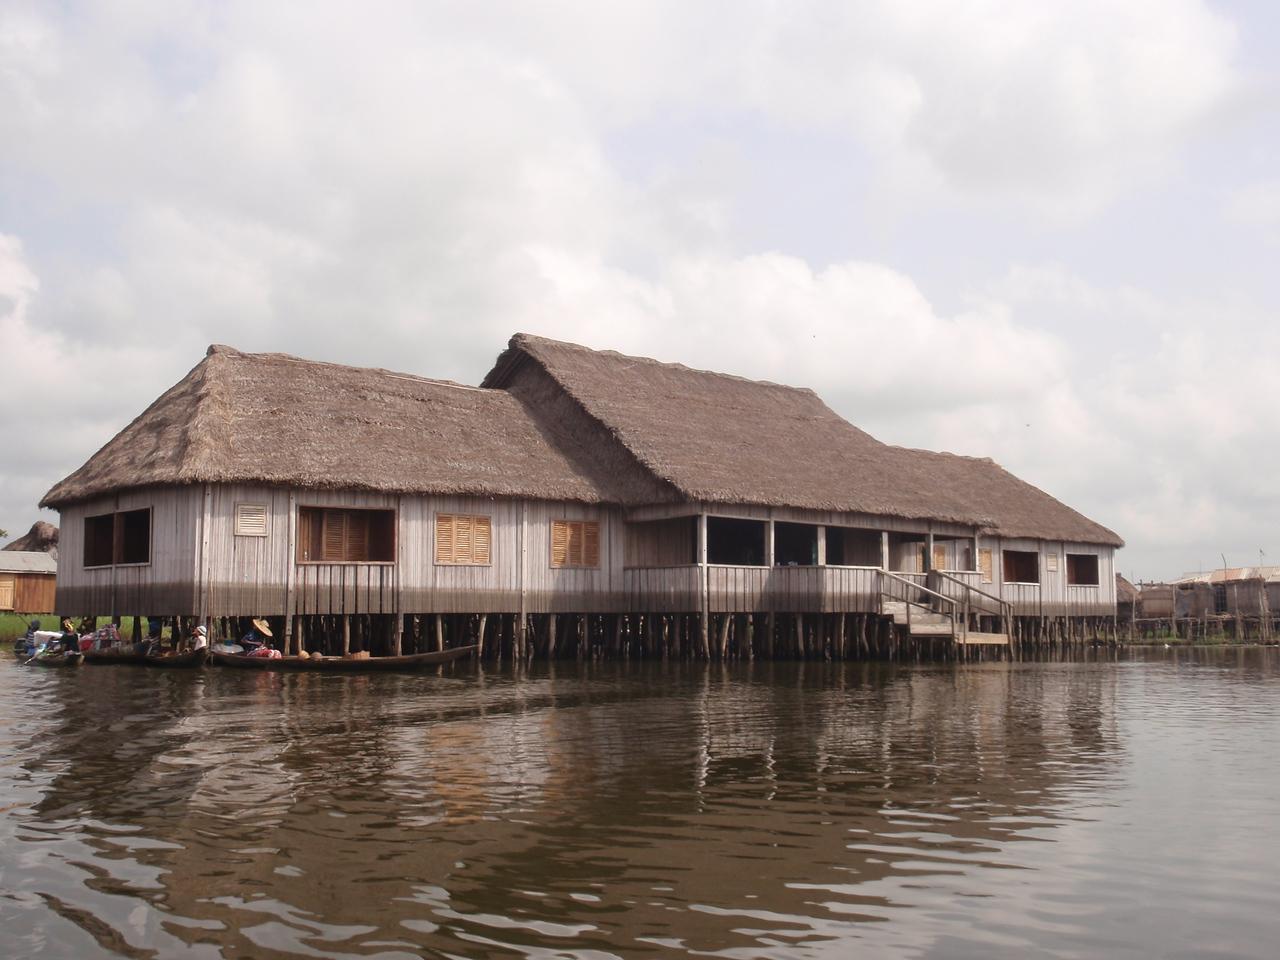 128_Ganvie Lake Community  Lake Nokoue  Bamboo Huts on Stilts